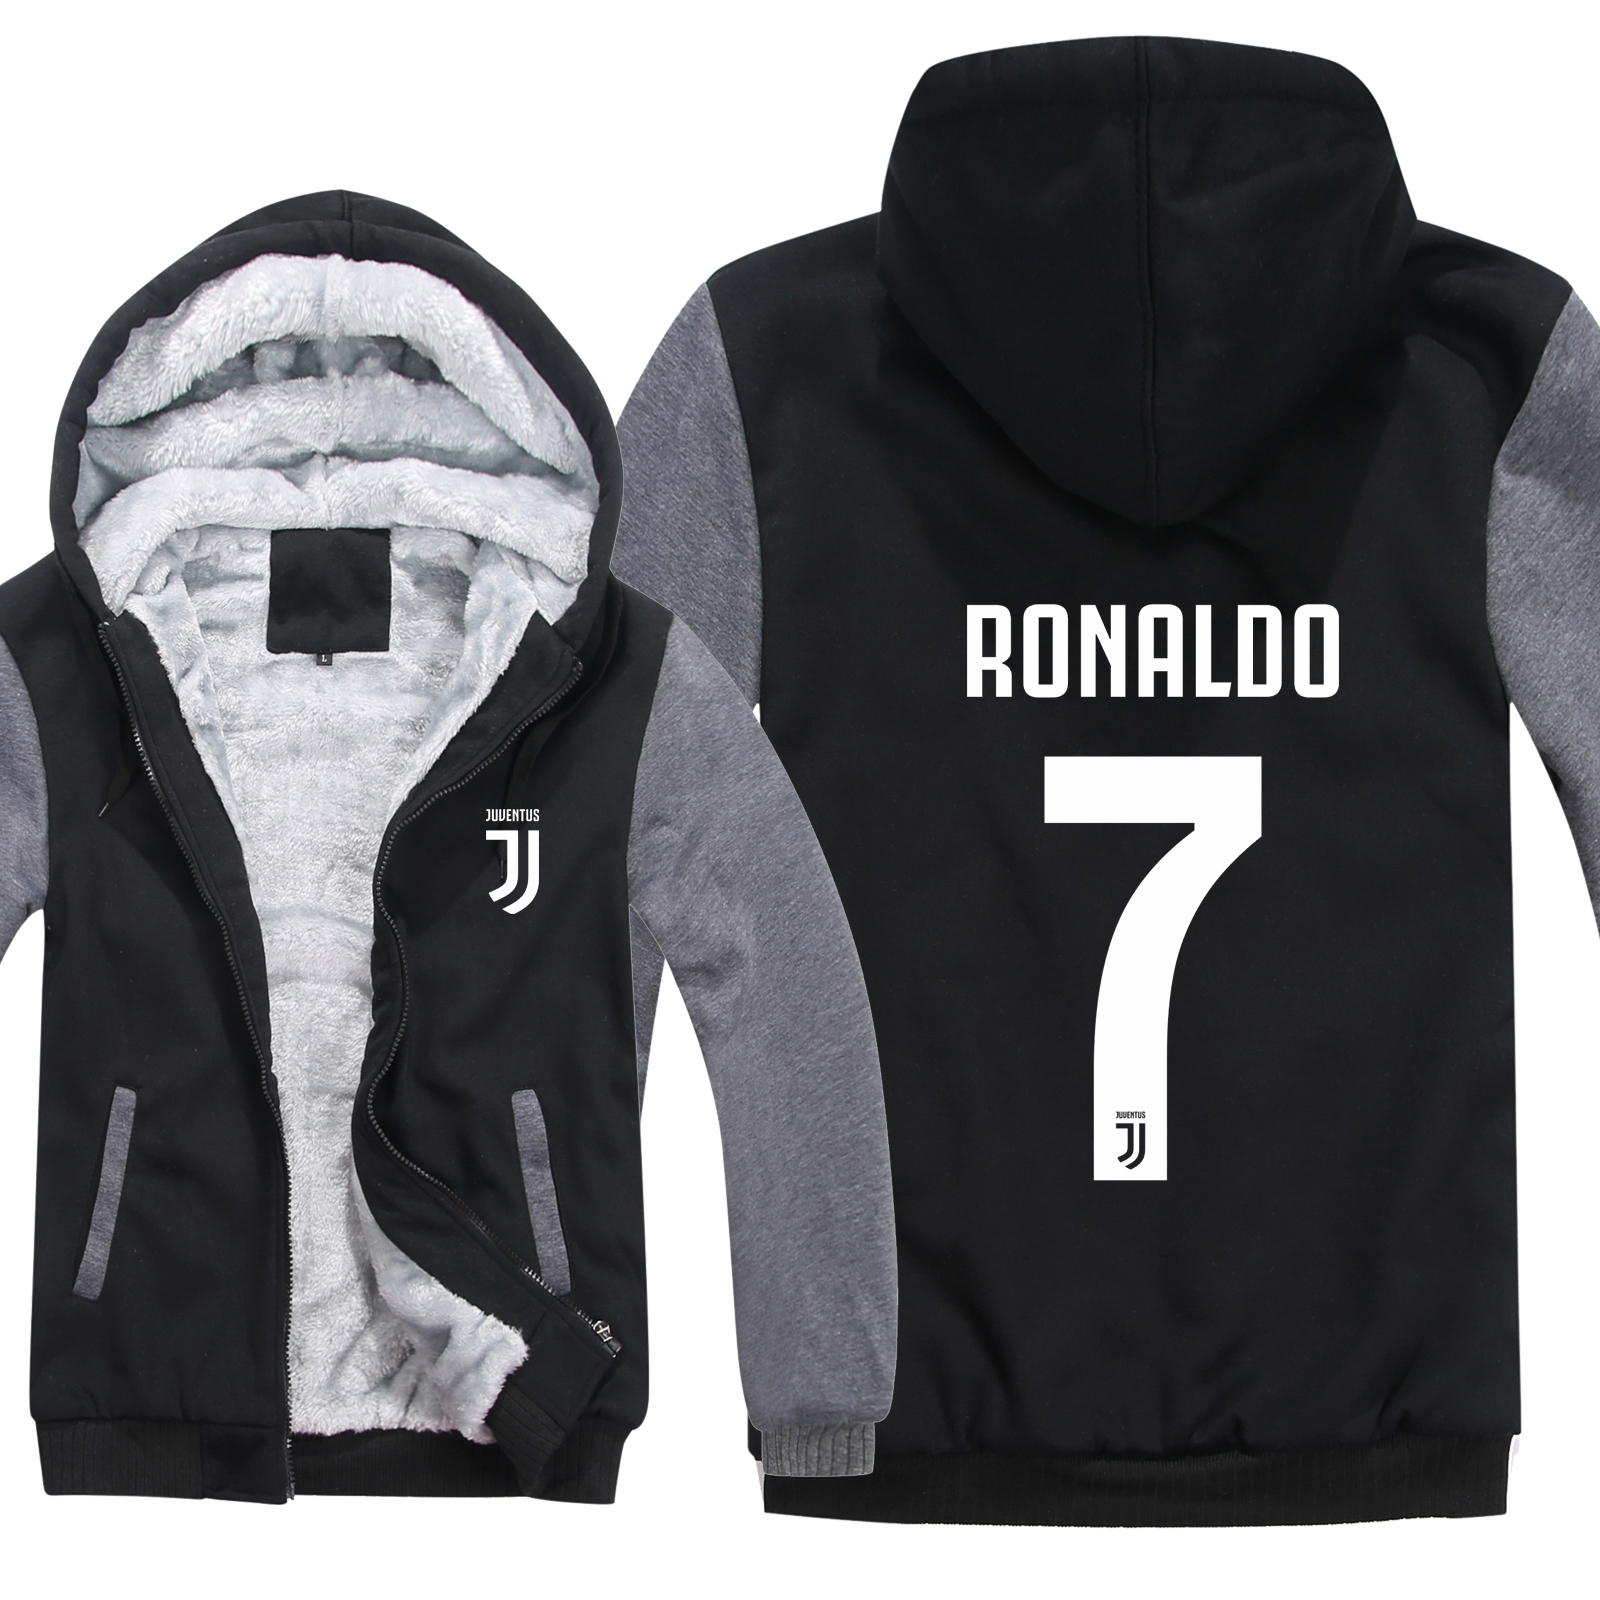 Hoodies Men Sweatshirts Jacket Pullover Wool-Liner Casual Coat CR7 Cristiano Ronaldo